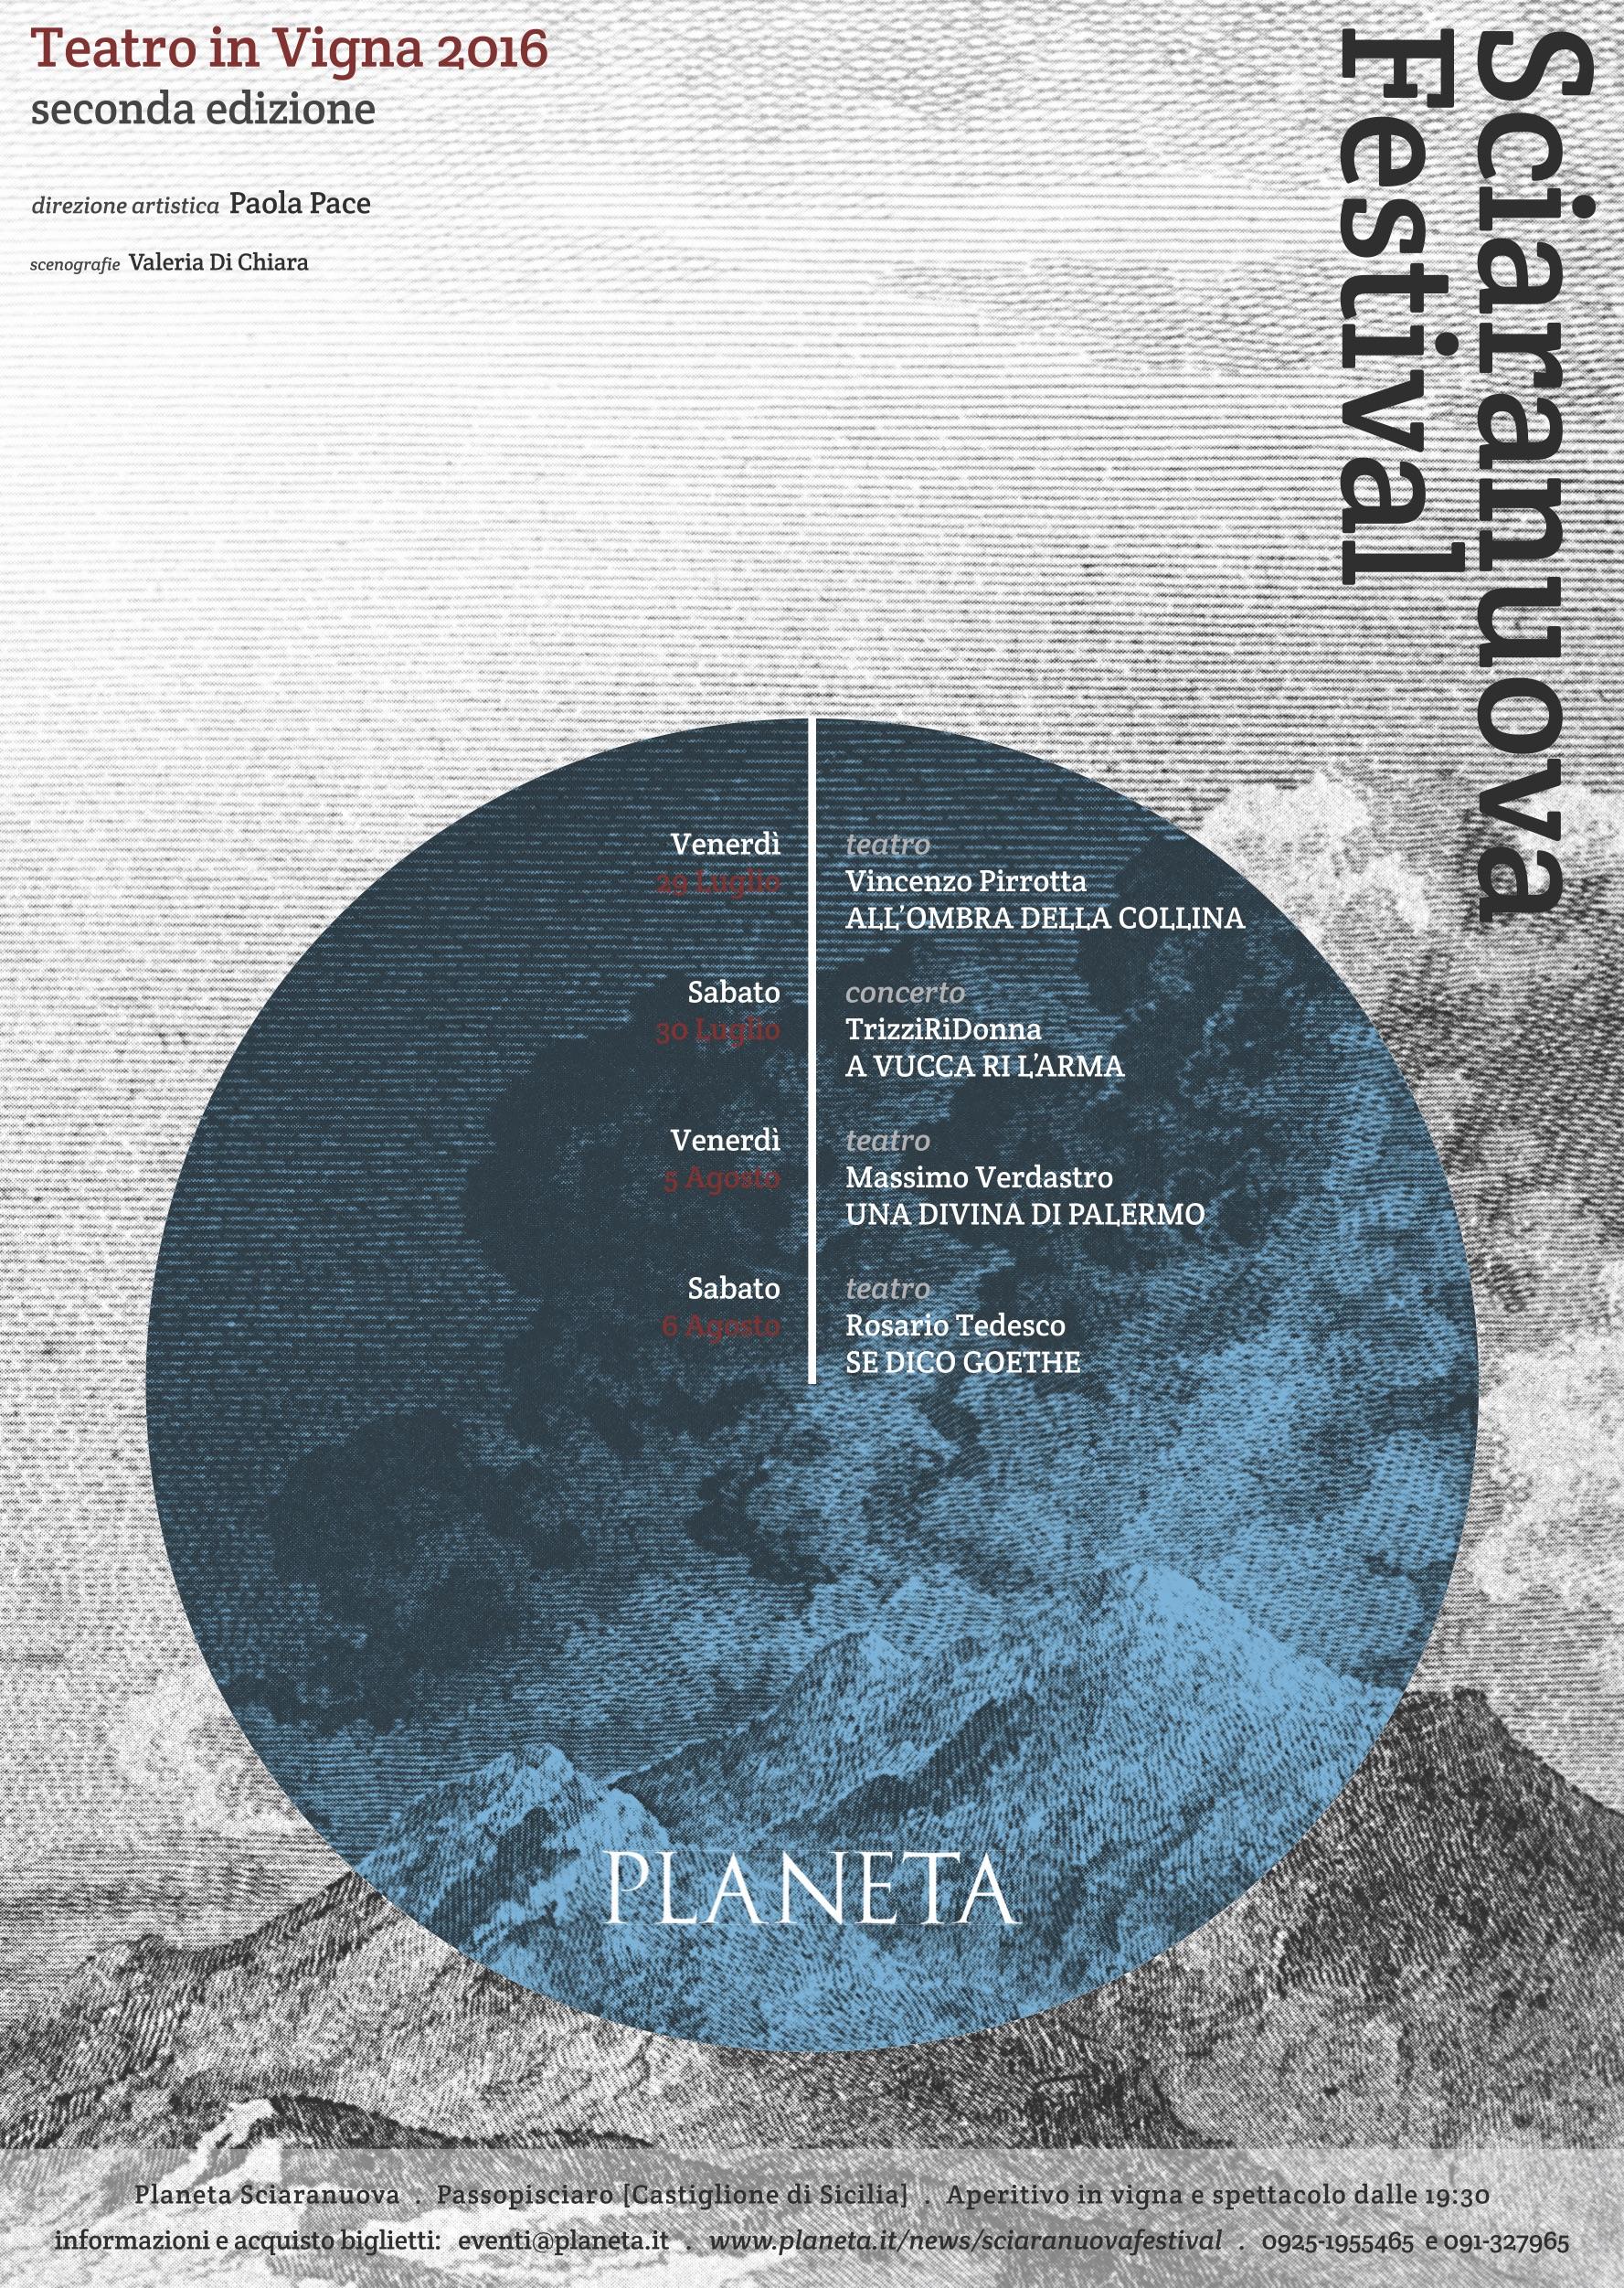 sciaranuova festival teatro in vigna planeta